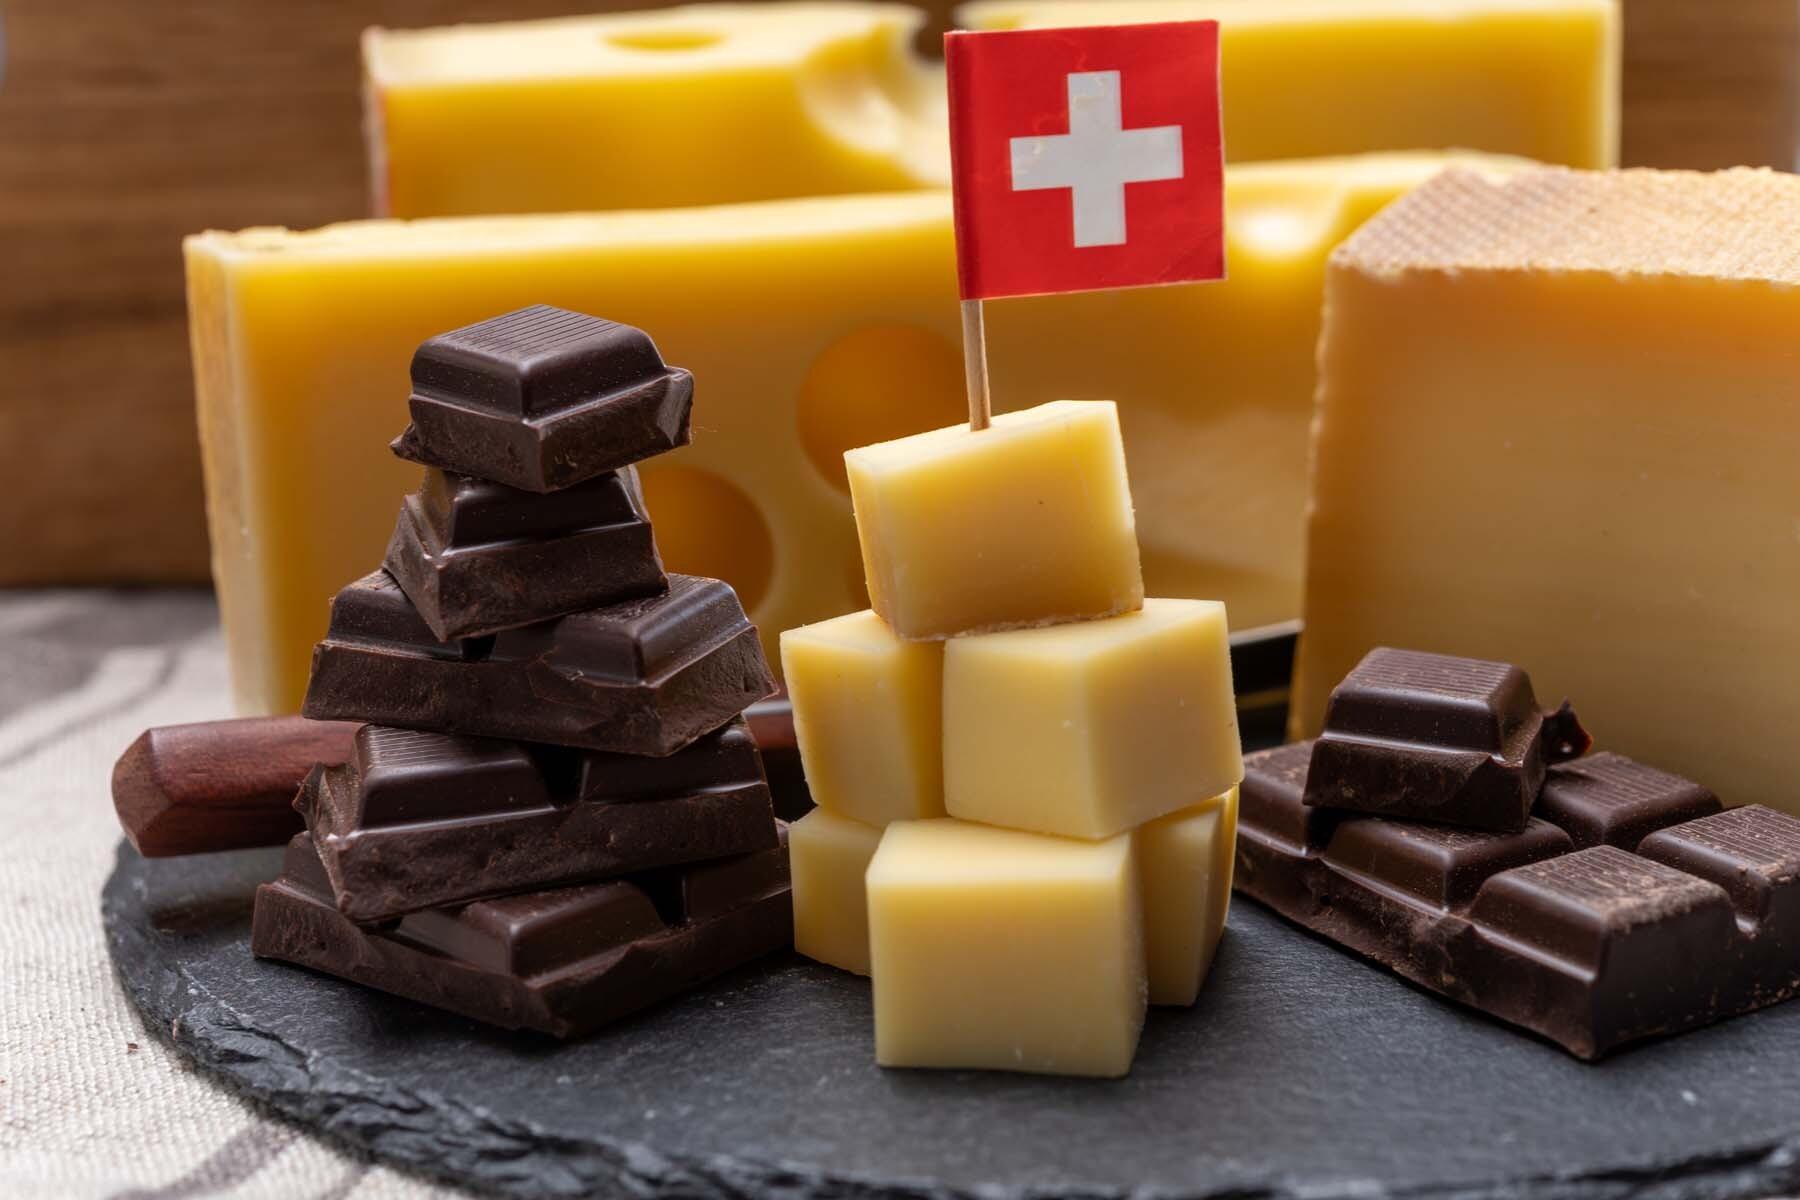 Swiss cheese and chocolate